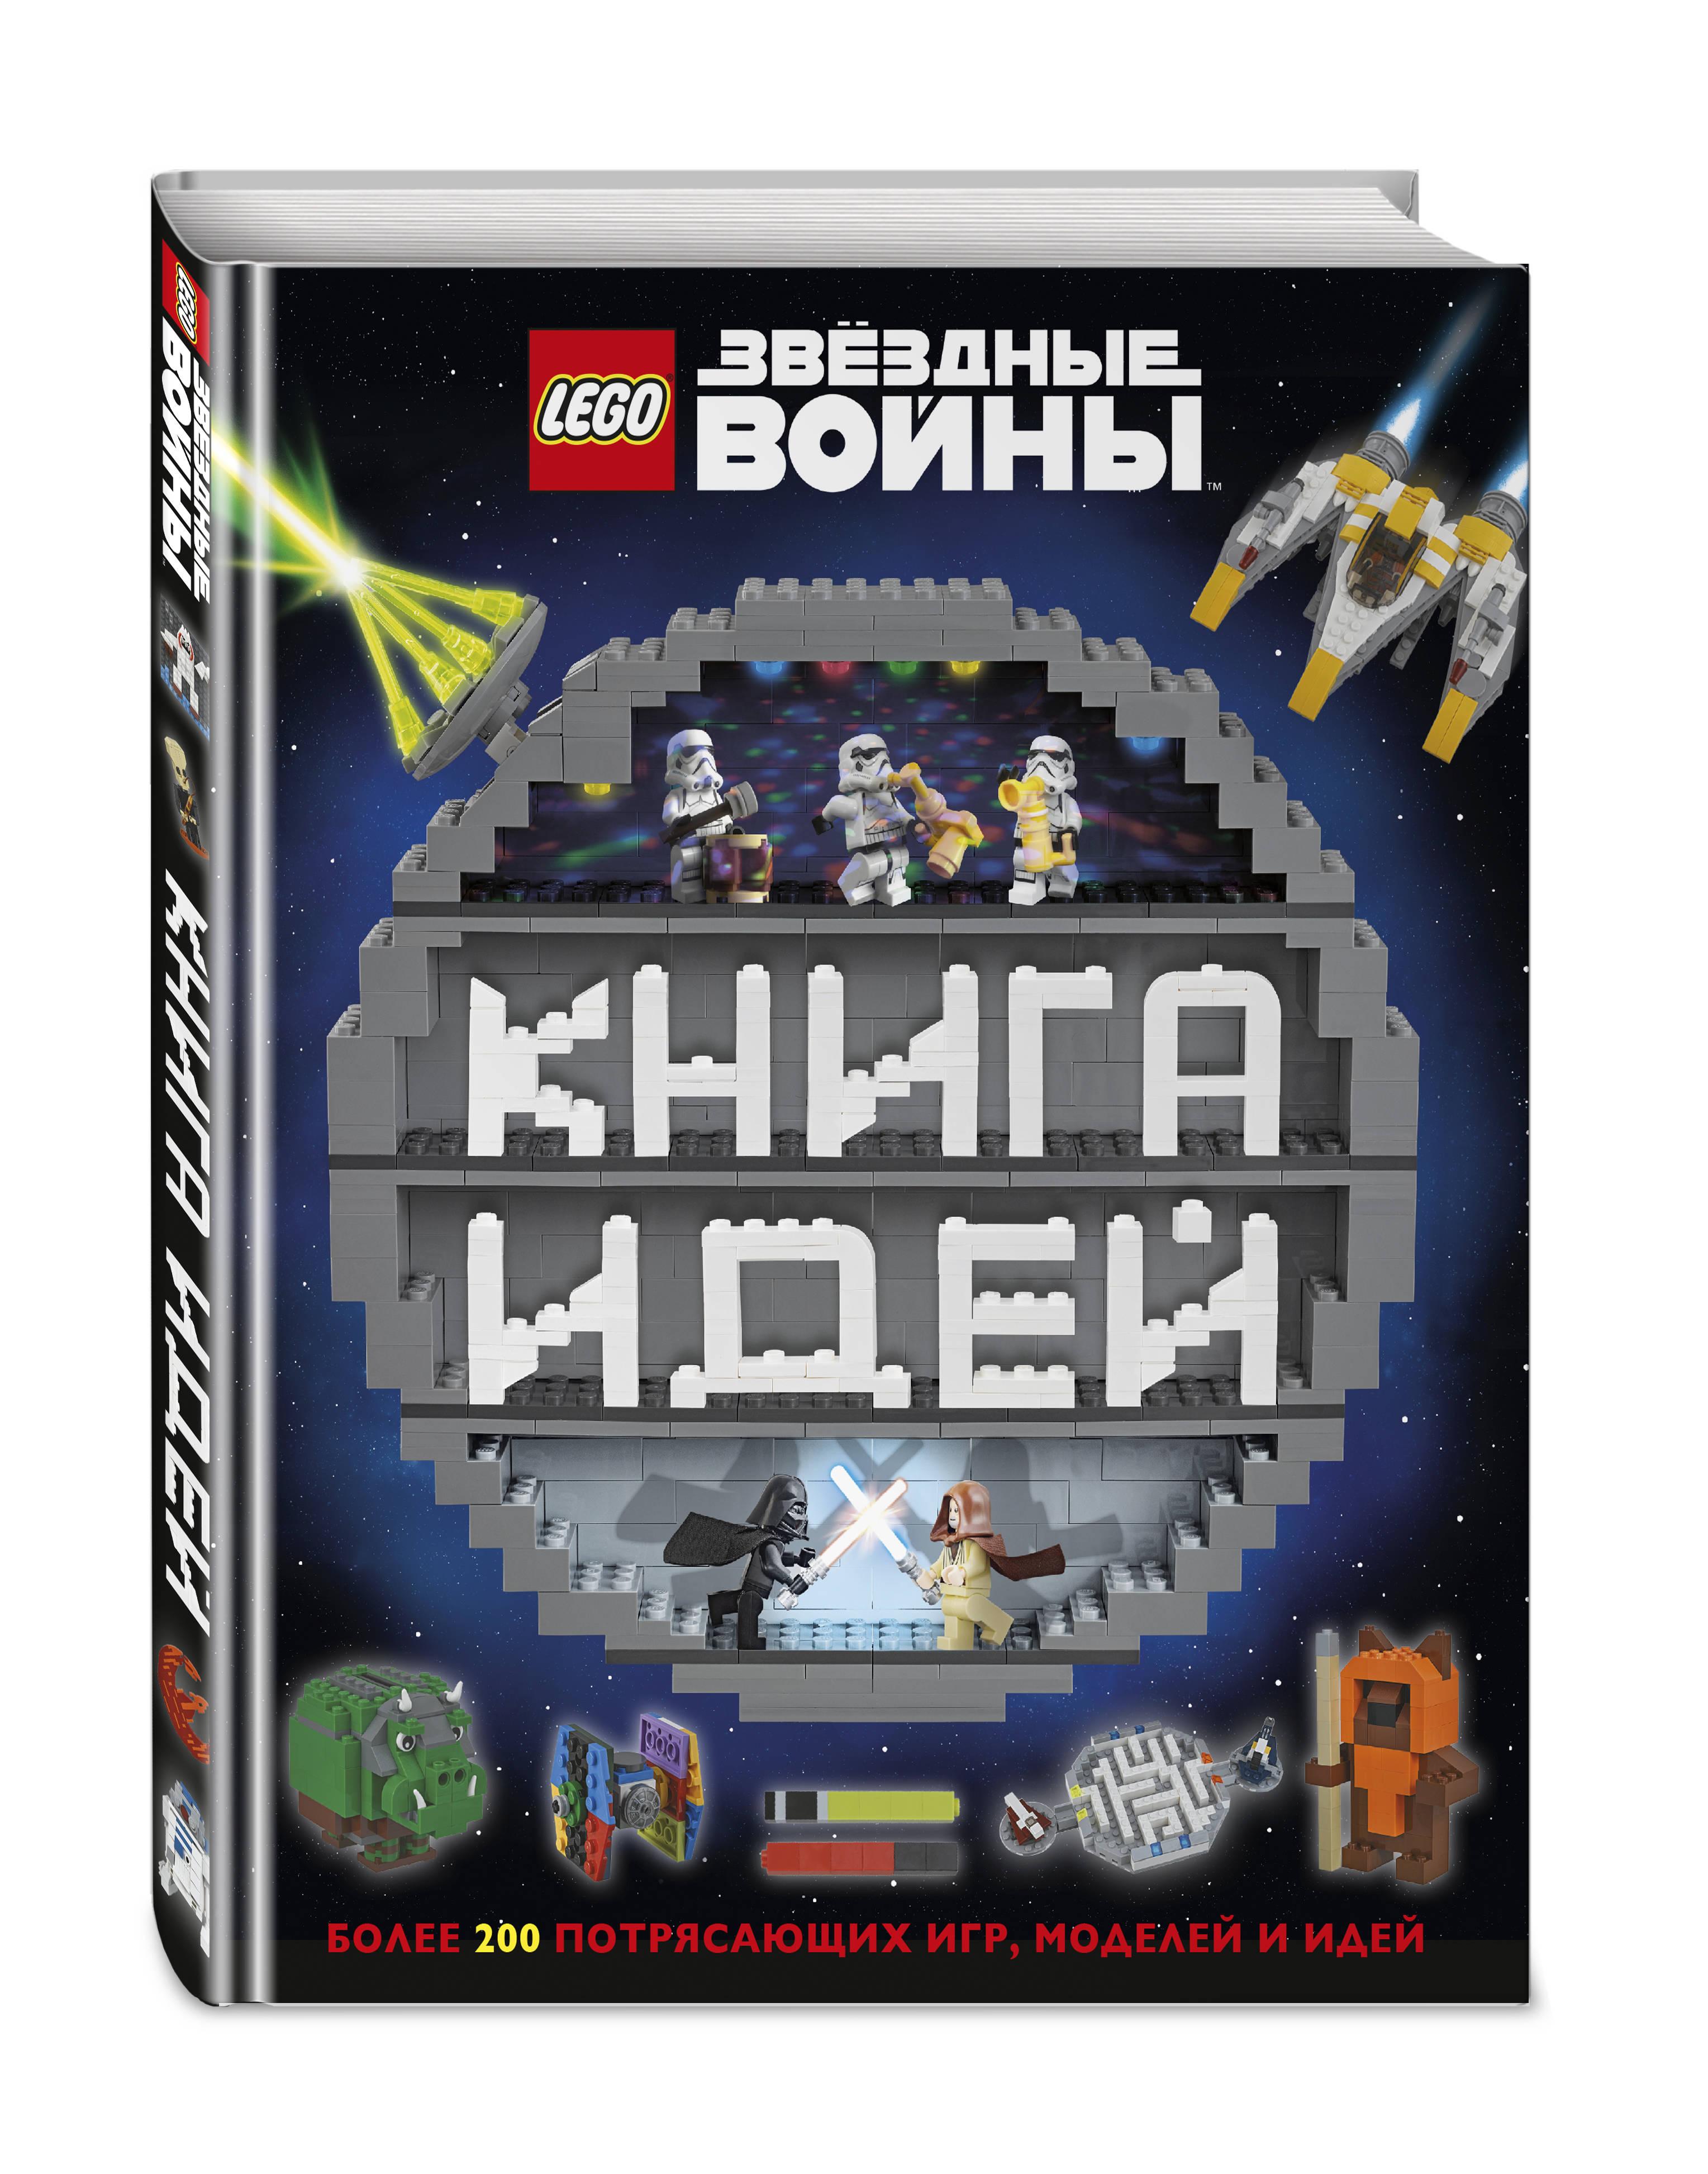 LEGO Star Wars. Книга идей мухаммад таки джа фари благоразумная жизнь